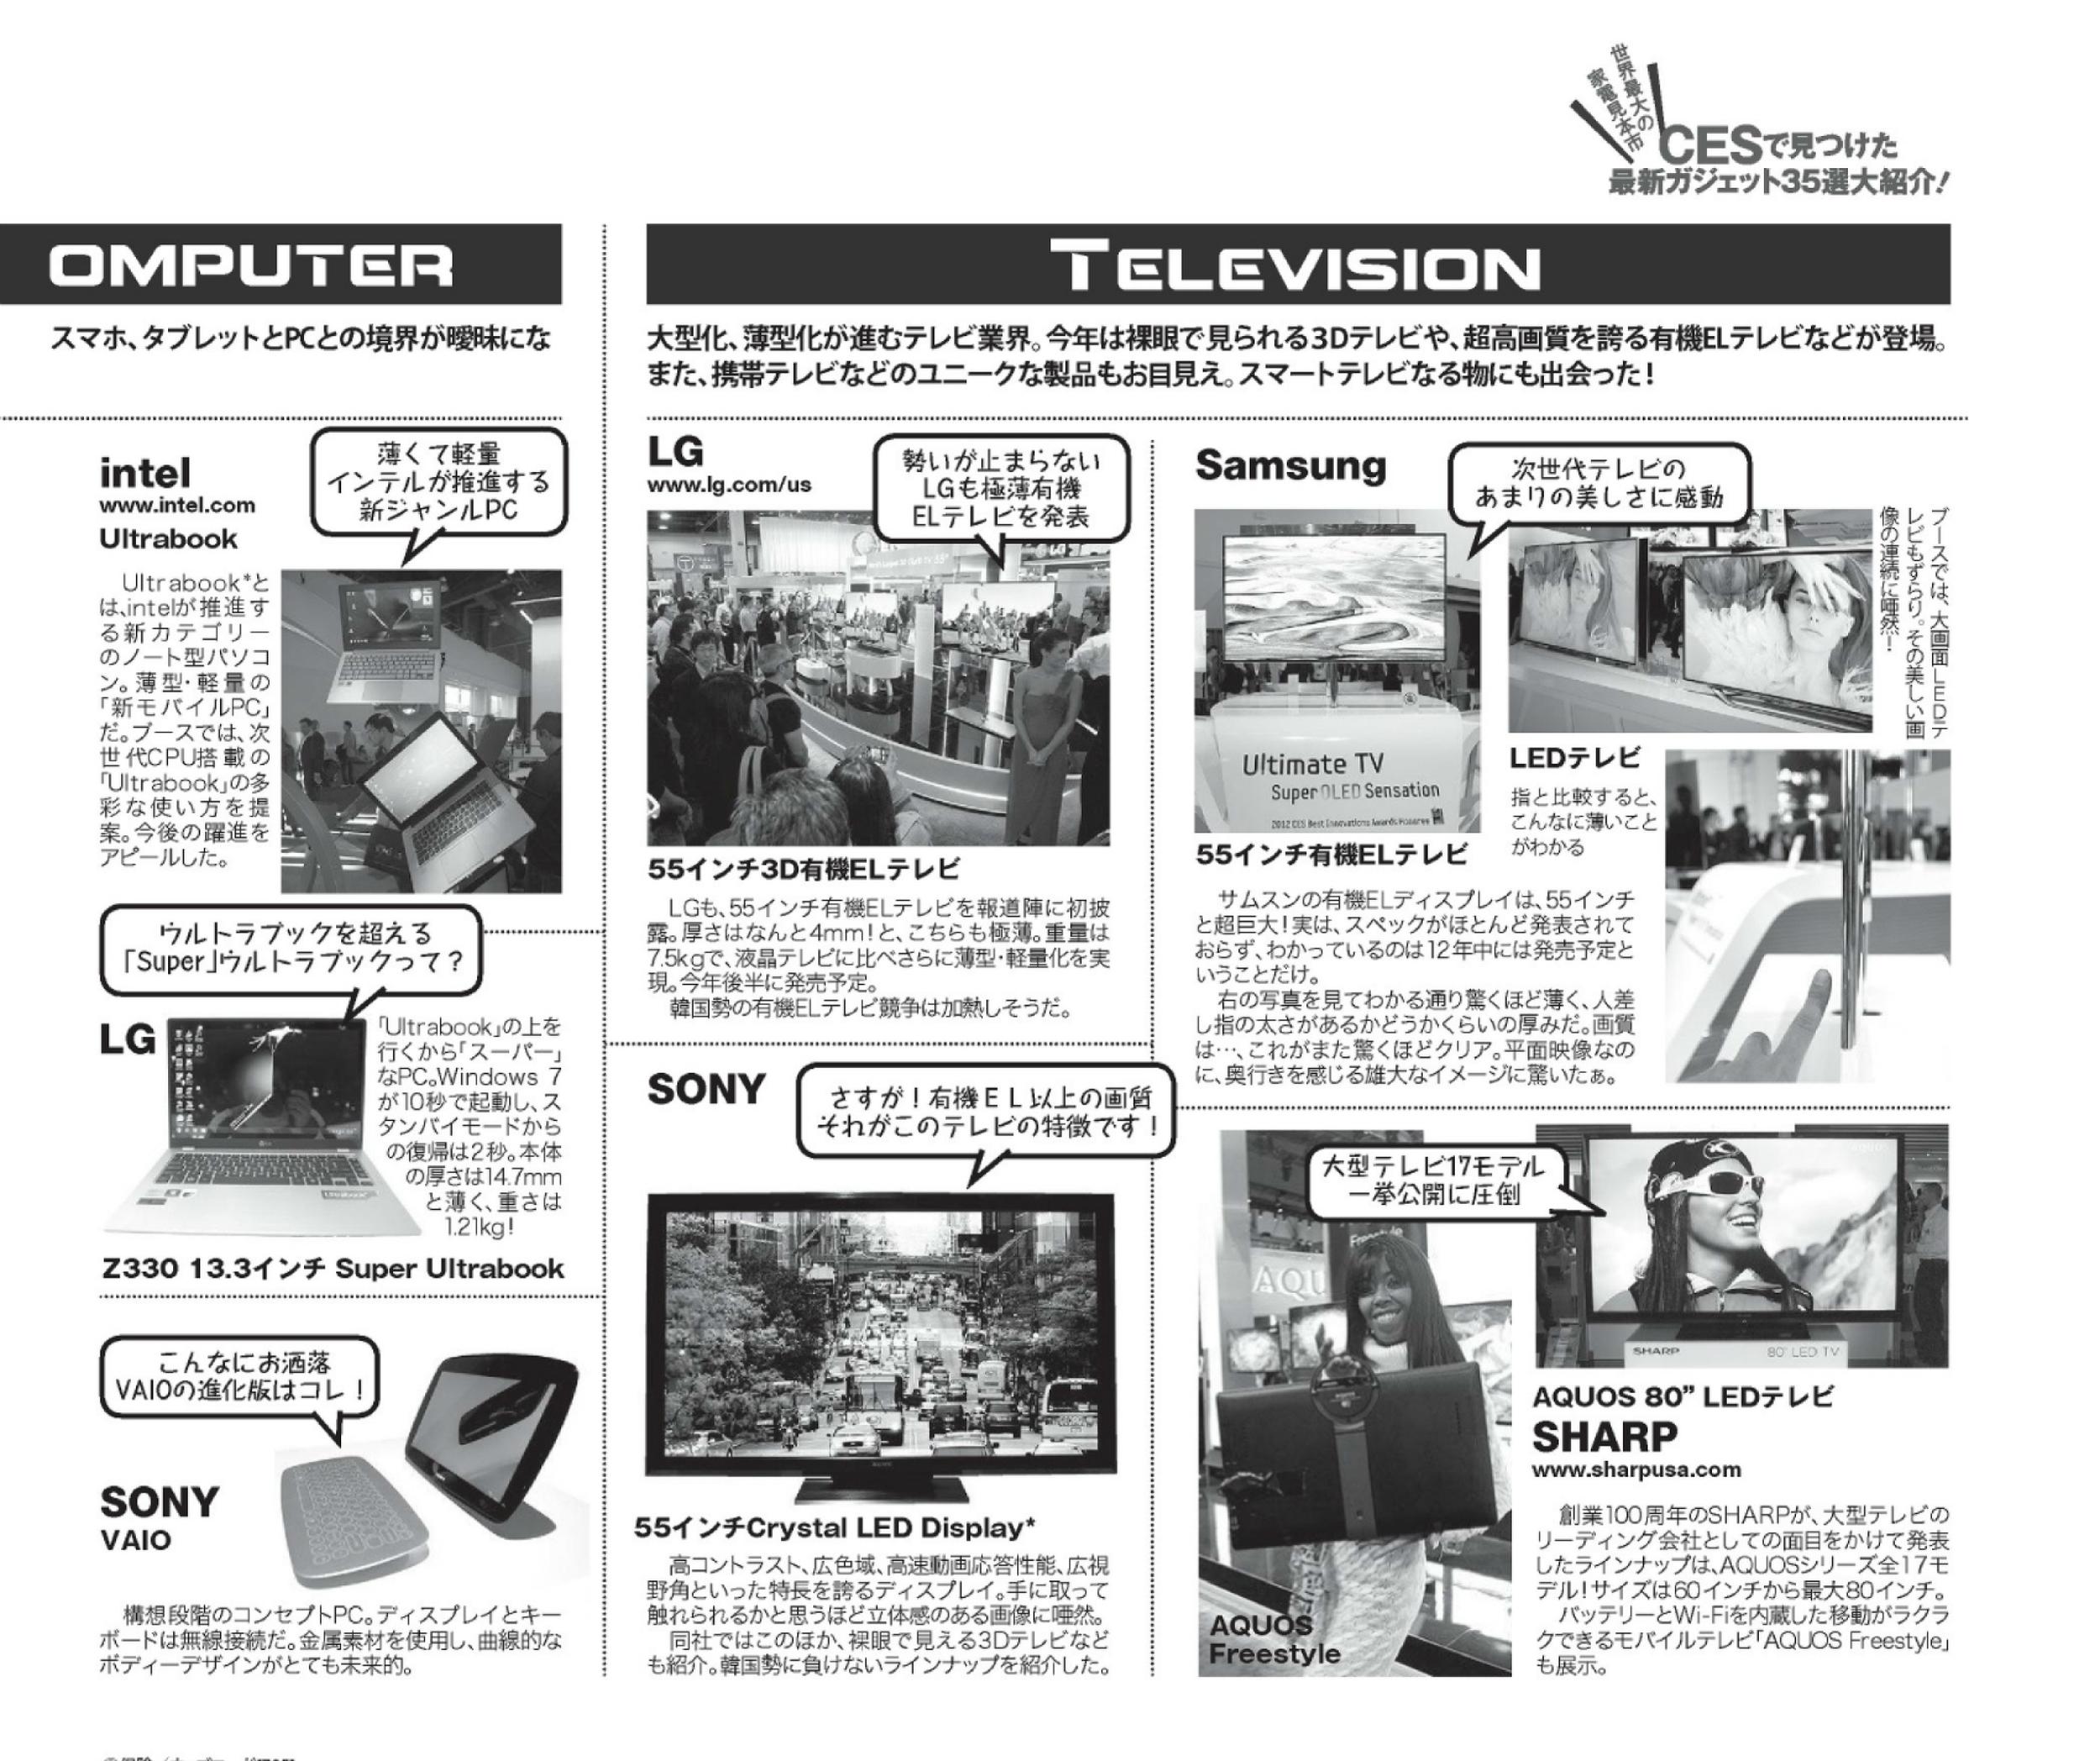 Lighthouse LA February 1, 2012 Page-1-4.jpg